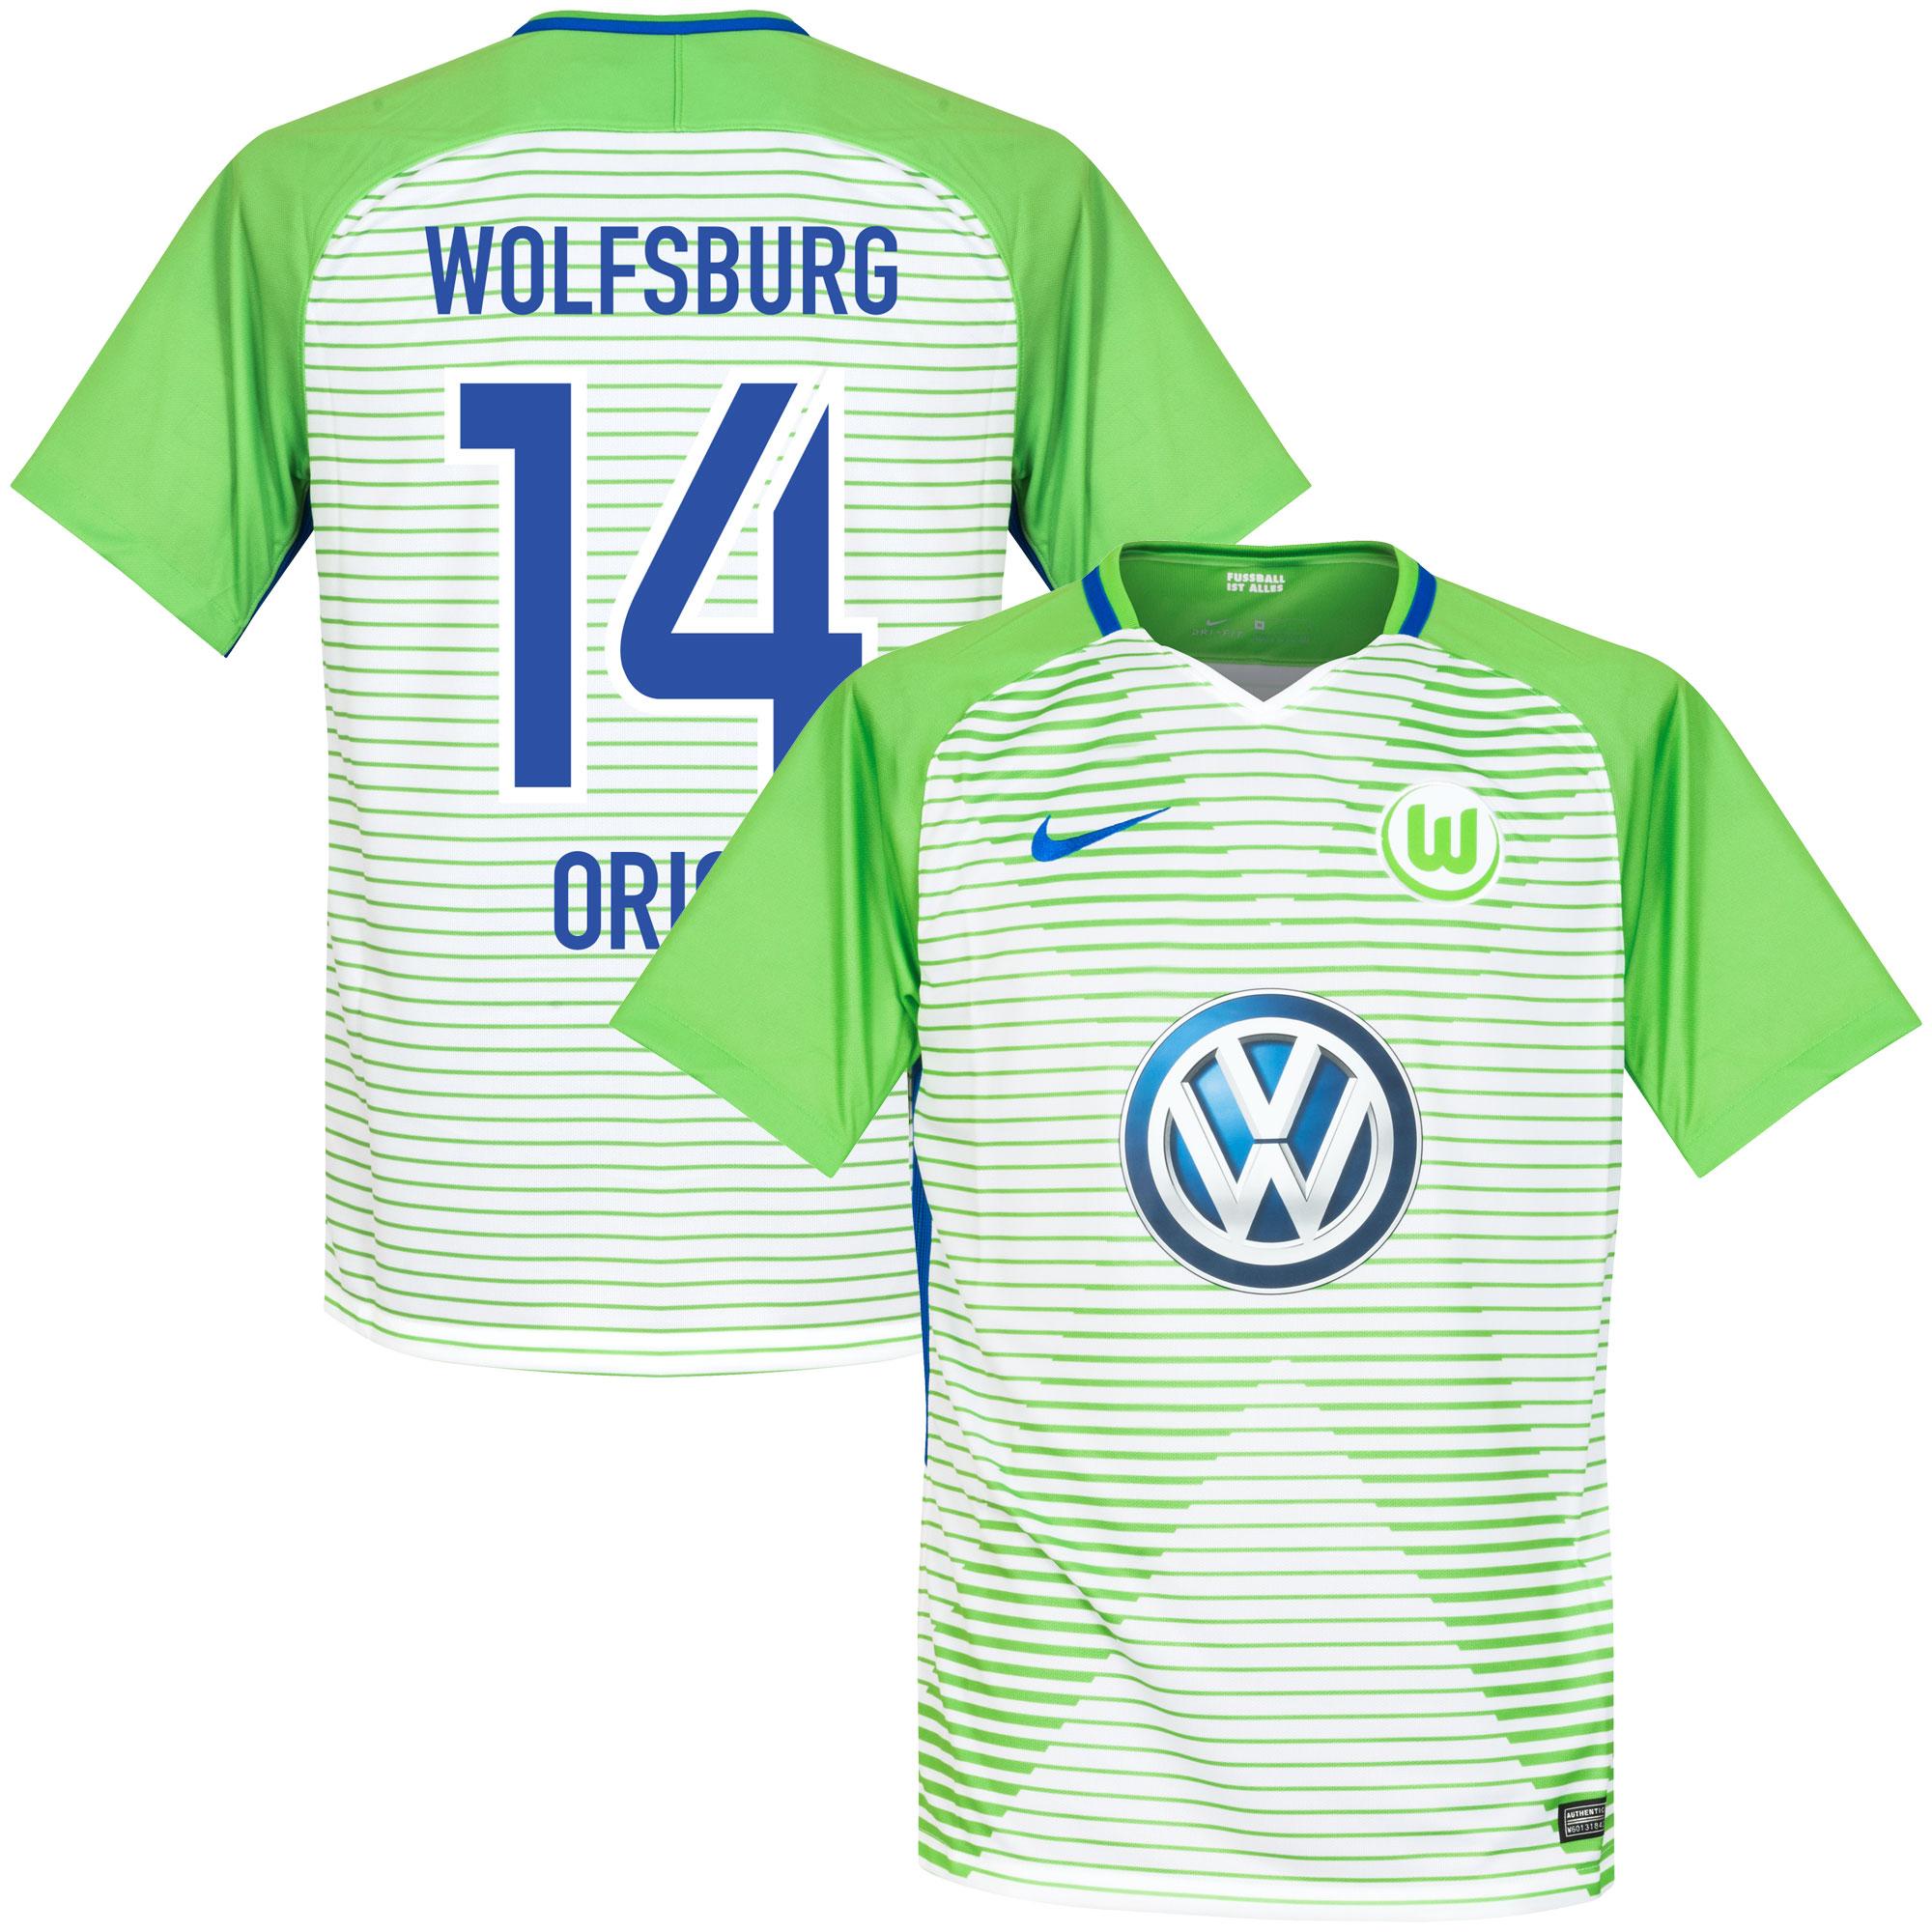 VfL Wolfsburg Home Origi Jersey 2017 / 2018 (Fan Style Printing) - XXL